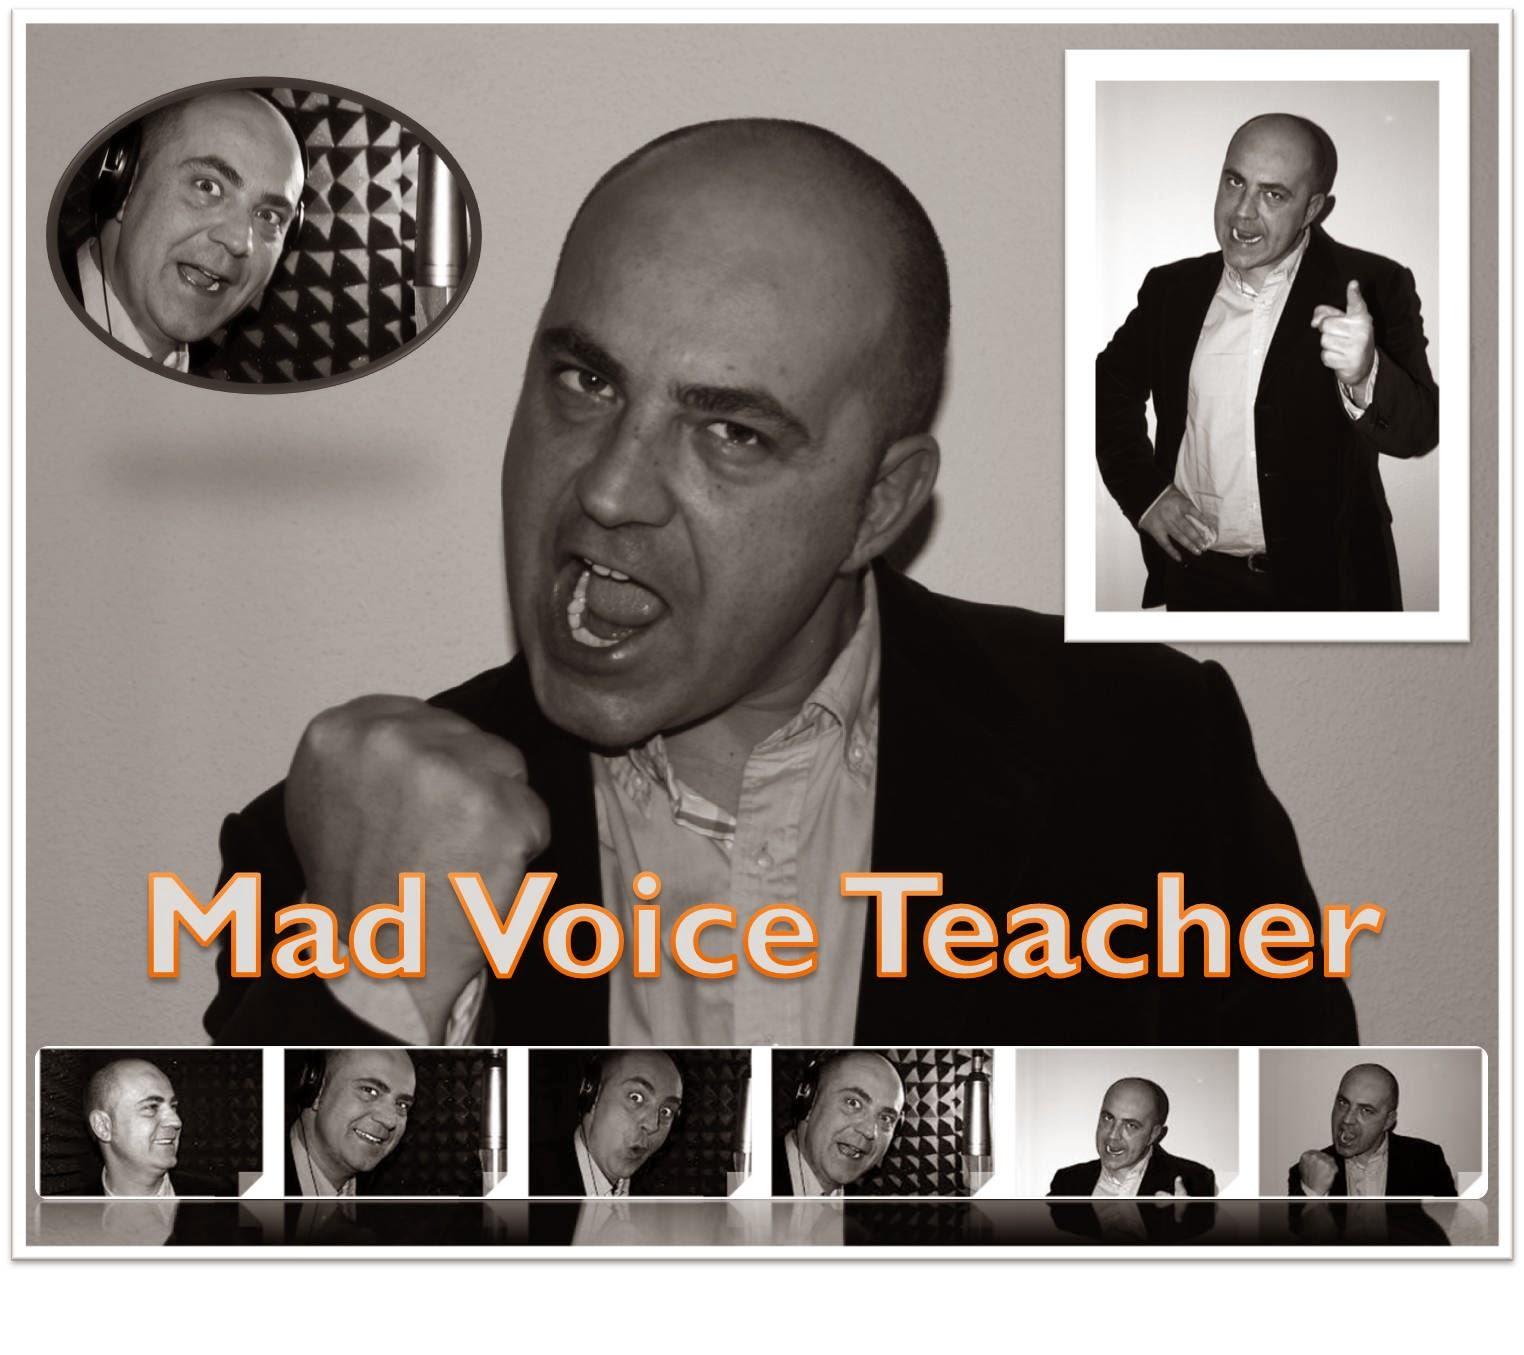 Mad Voice Teacher